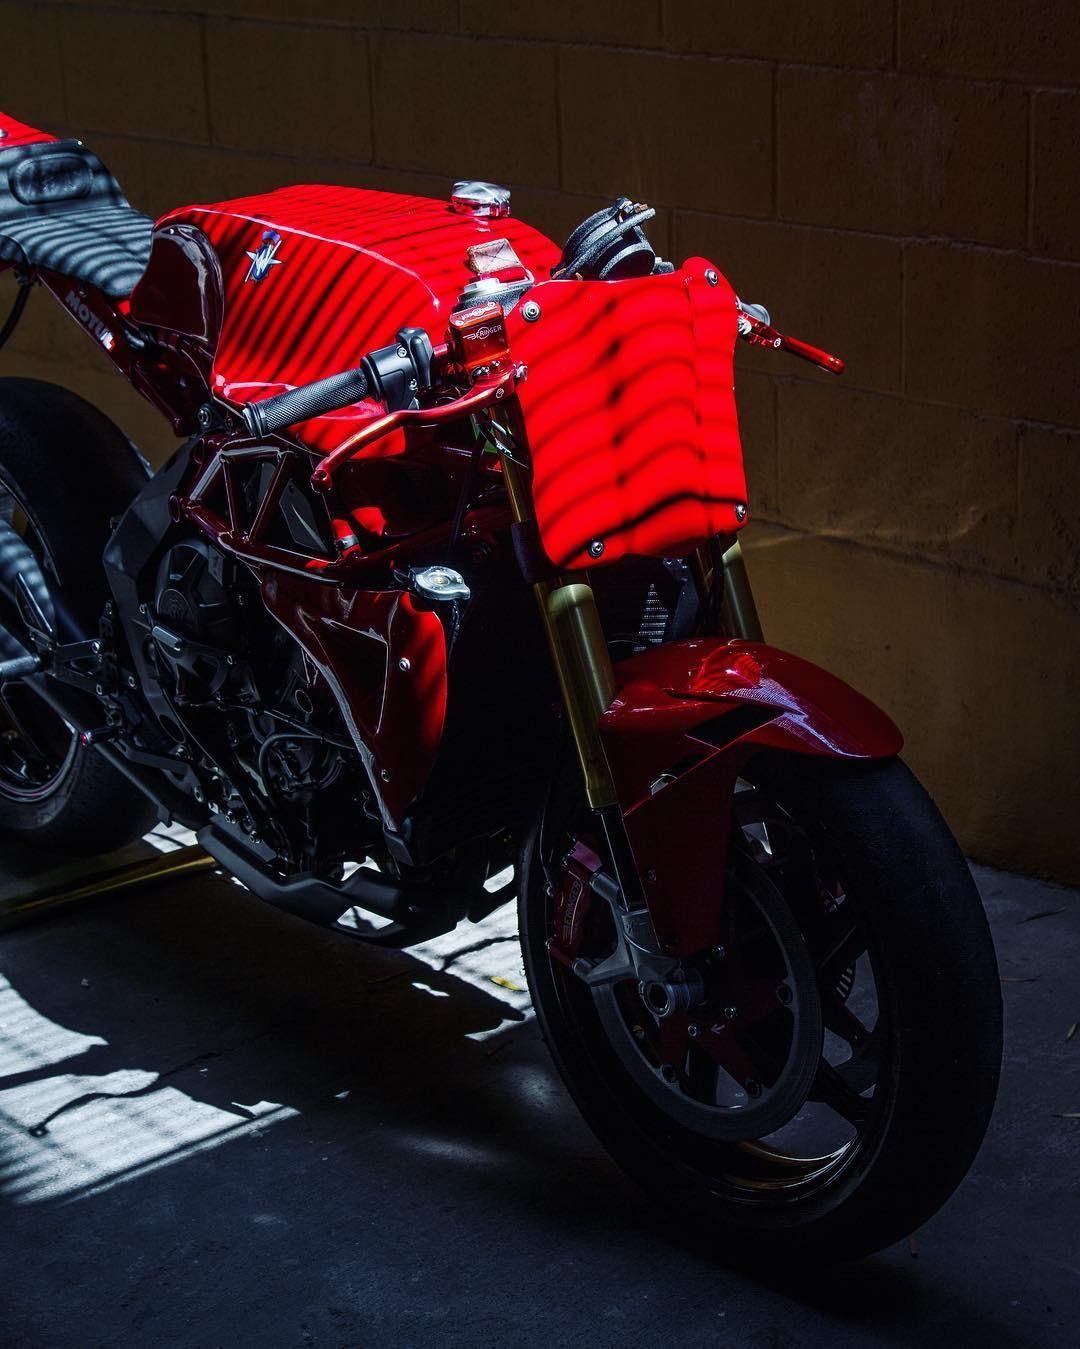 Ago TT, la MV Brutale 800 RR di Deus - News - Moto.it